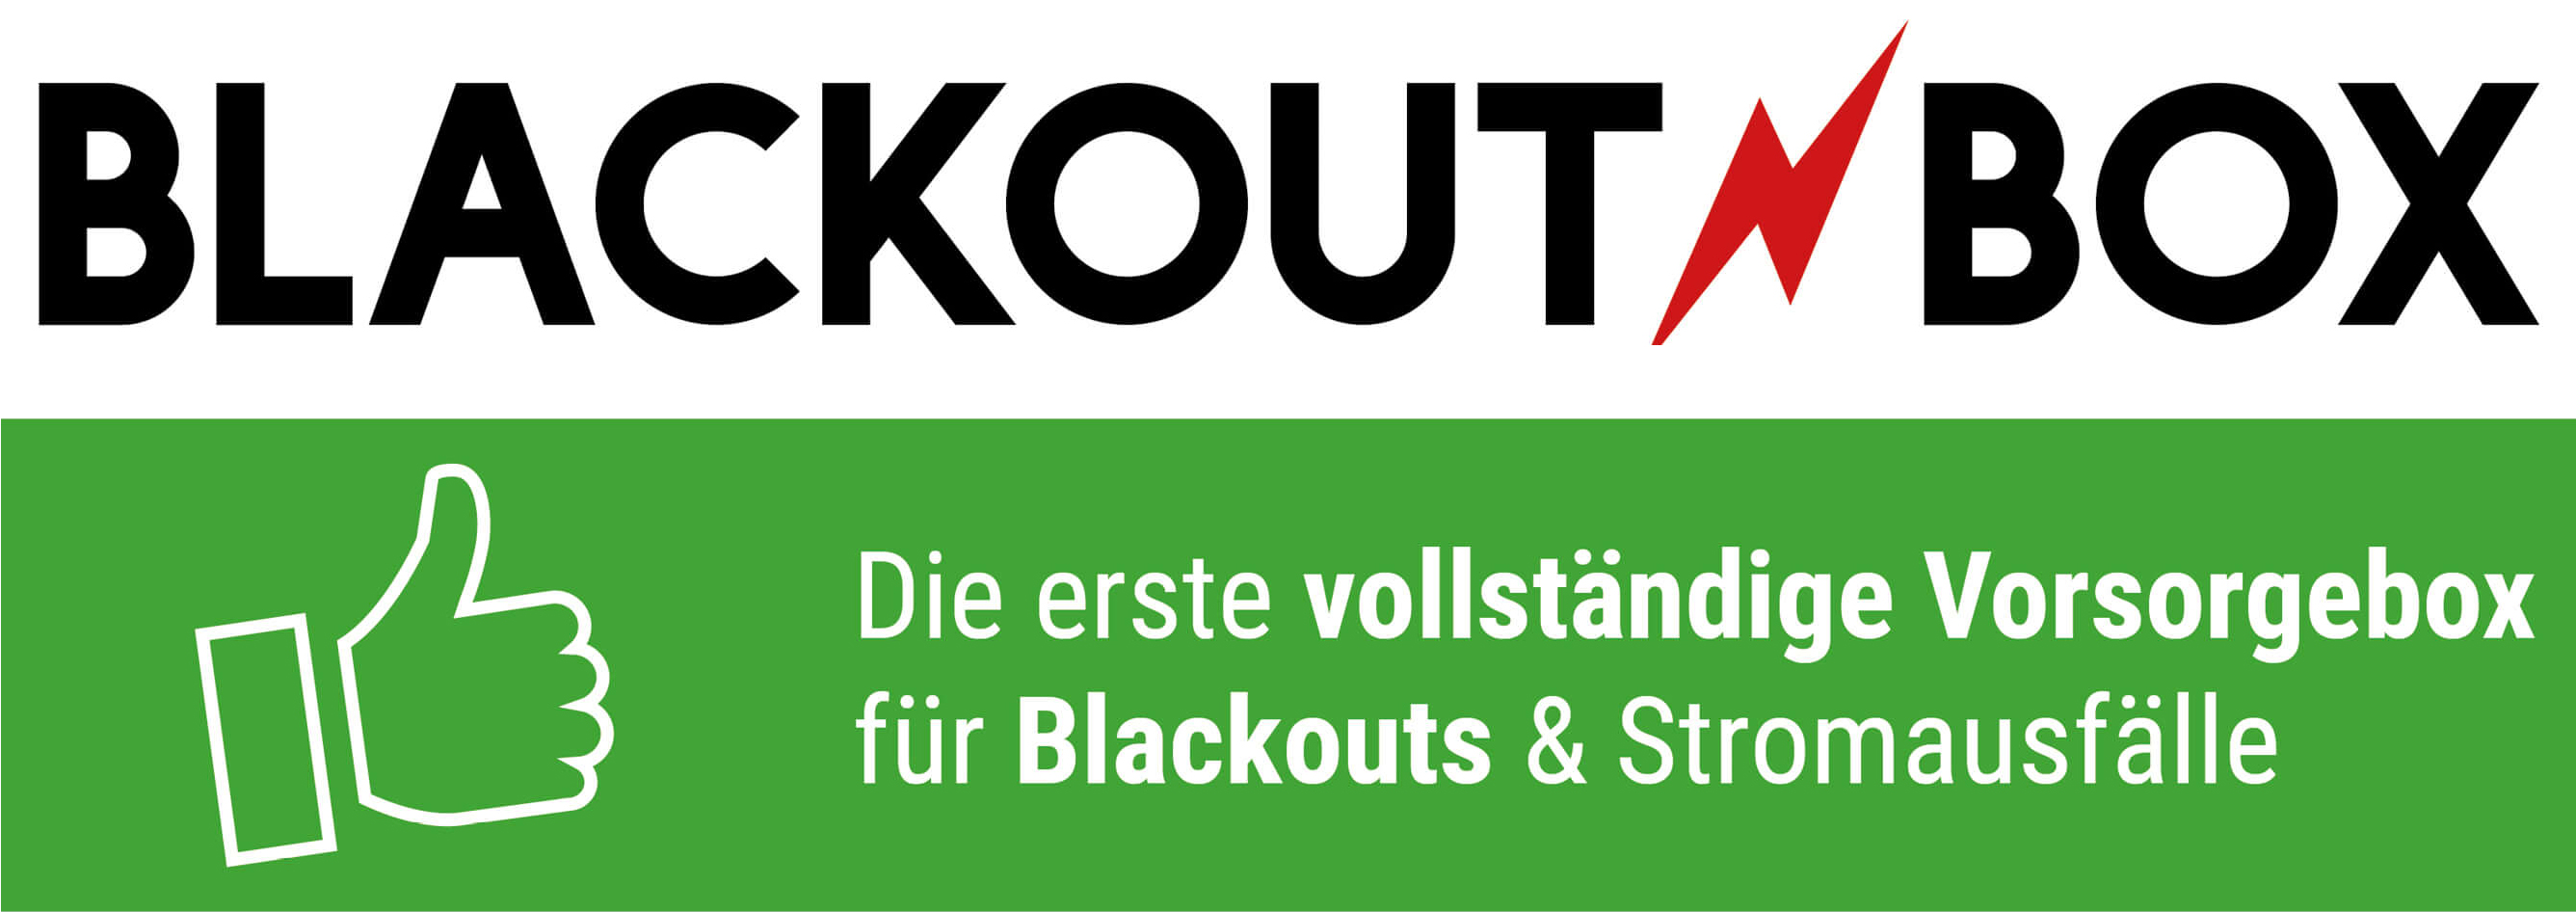 Blackoutbox